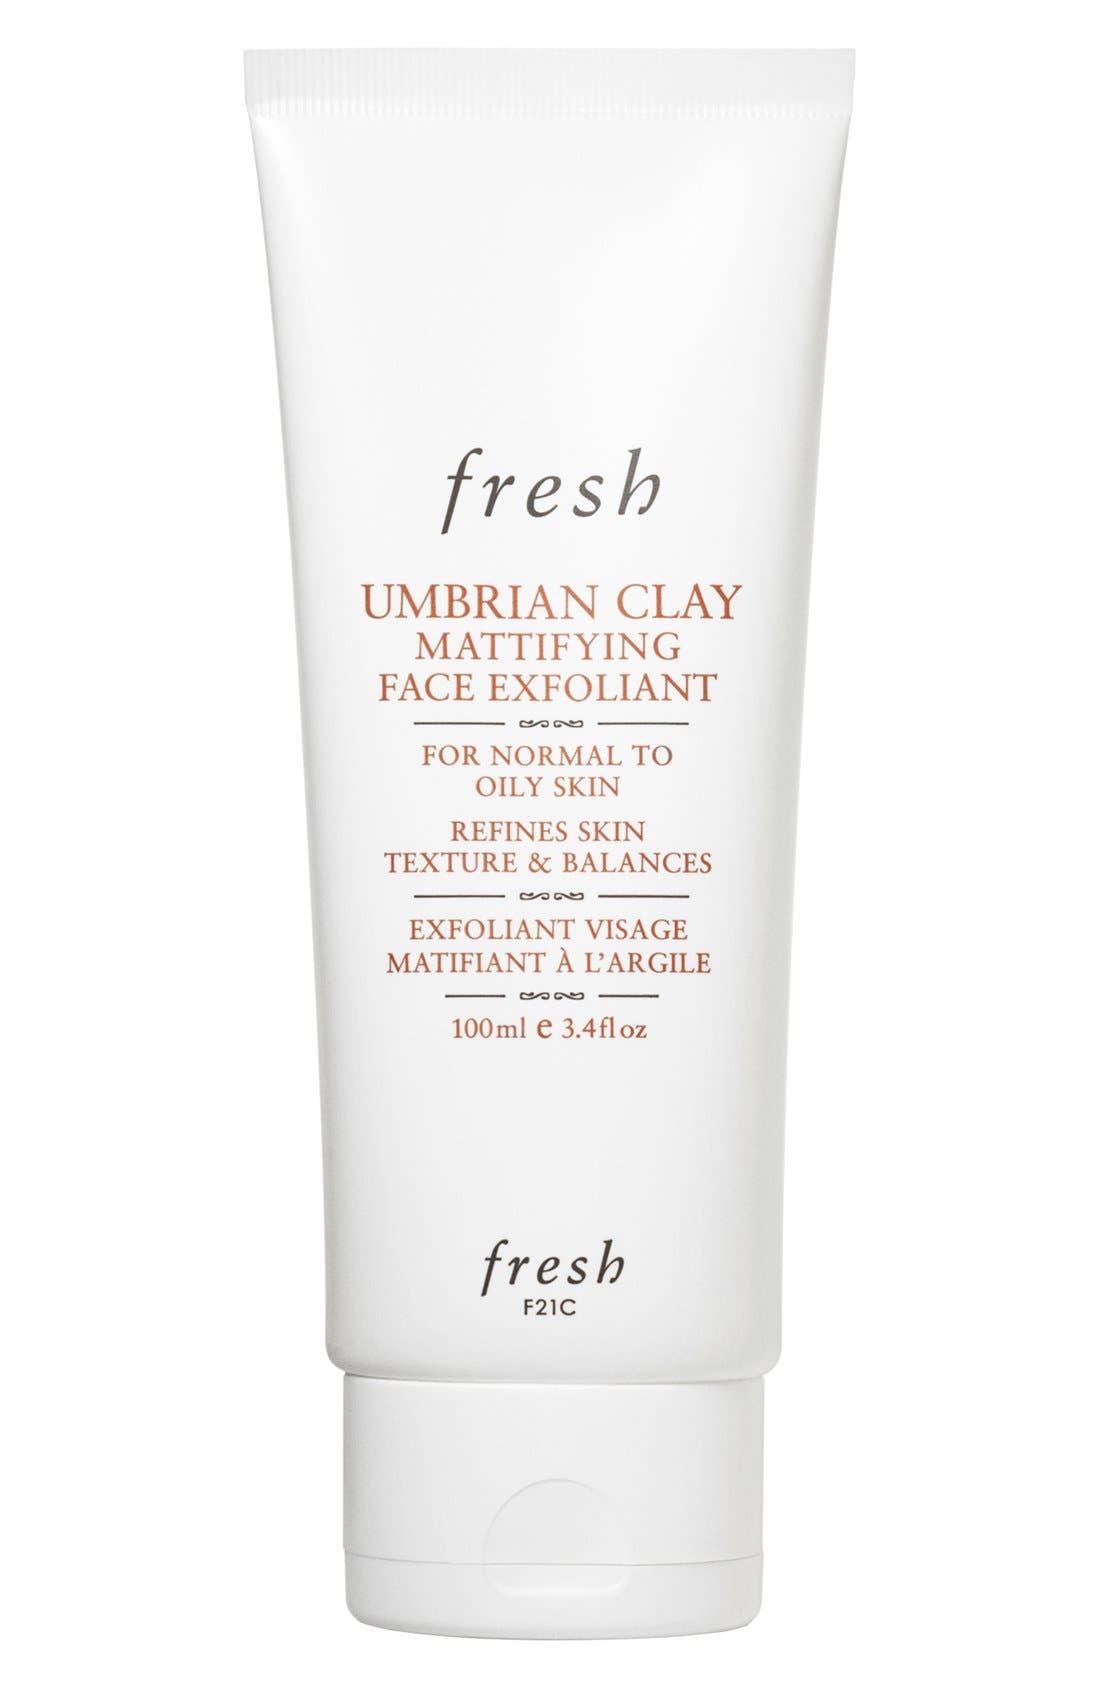 Fresh® Umbrian Clay Mattifying Face Exfoliant